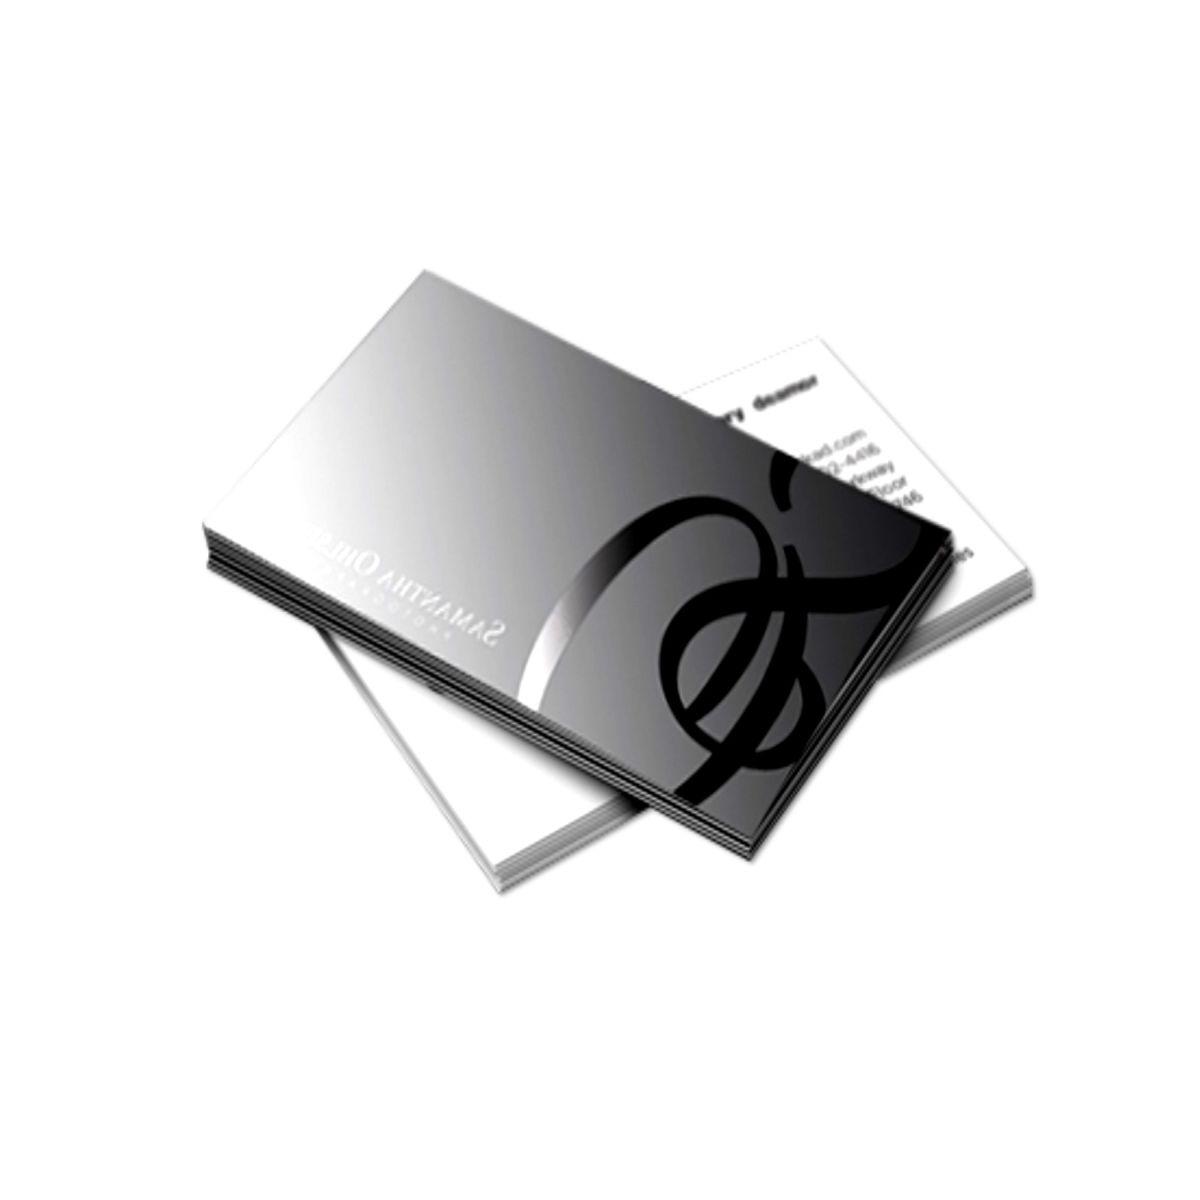 Spot UV Business Cards-022118-1